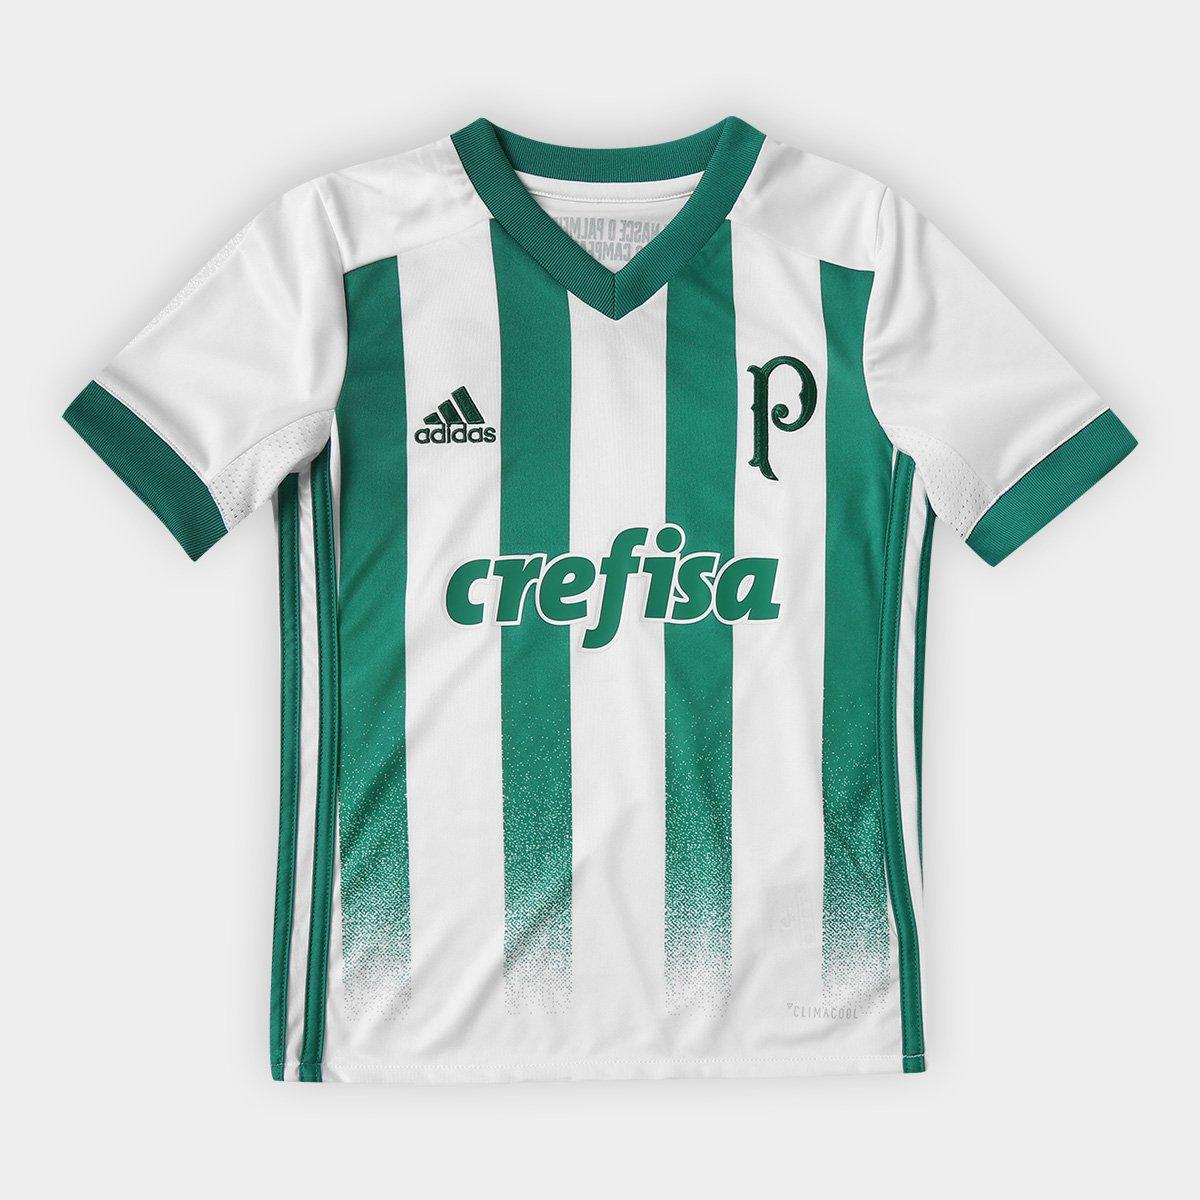 bdedc8a401 Camisa Palmeiras Infantil II 17/18 Torcedor Adidas - Branco | Allianz  Parque Shop